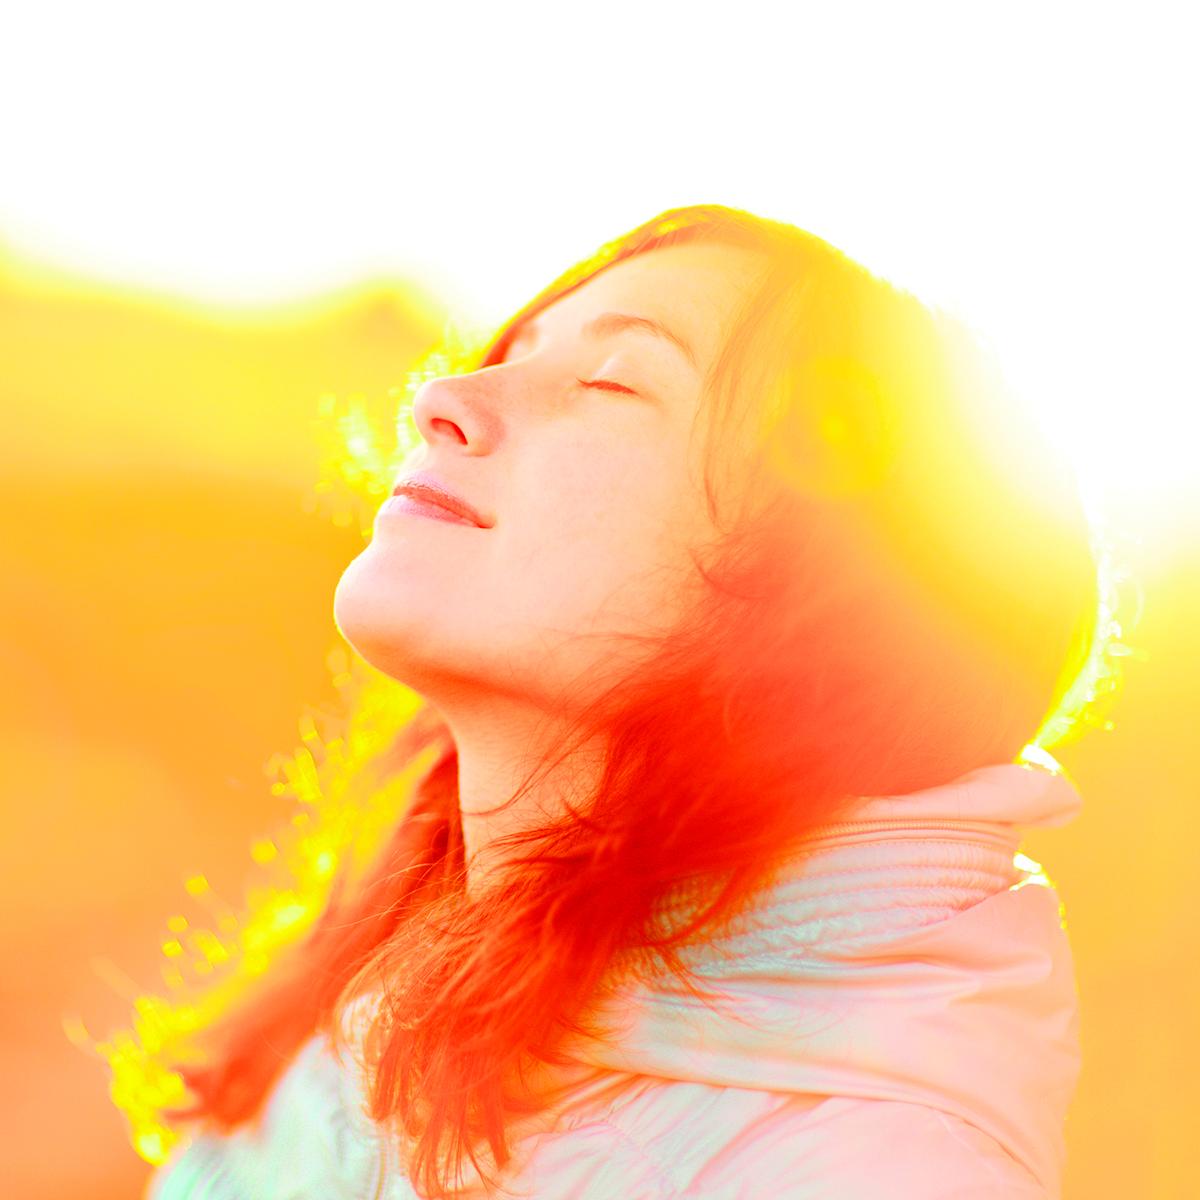 Z:\603-20180714\Final\B Section\B22-26 health\woman-soaking-up-the-sun.jpg